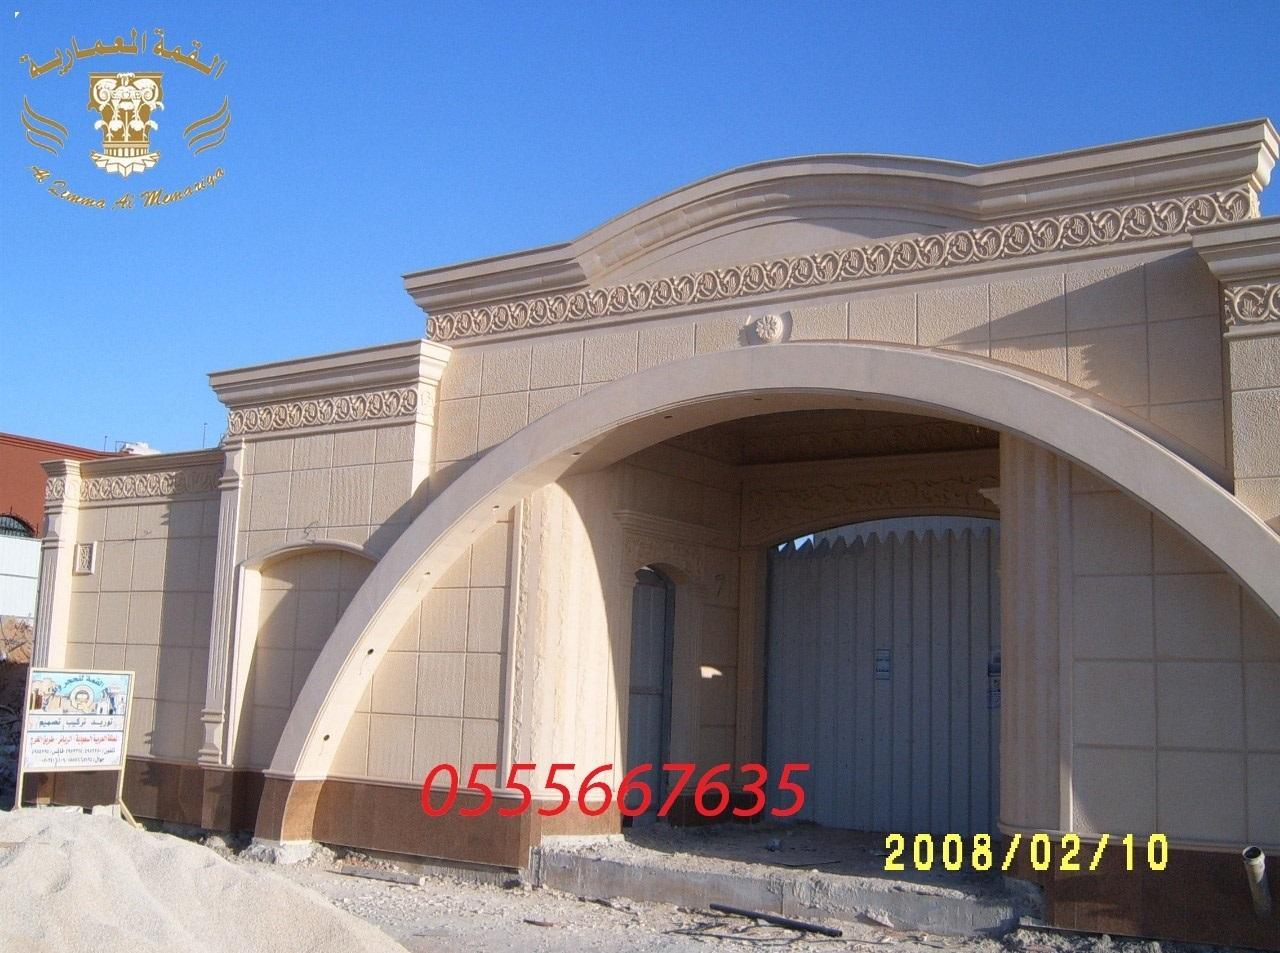 سعودي واجهات تركيب ديكورات 0555667635